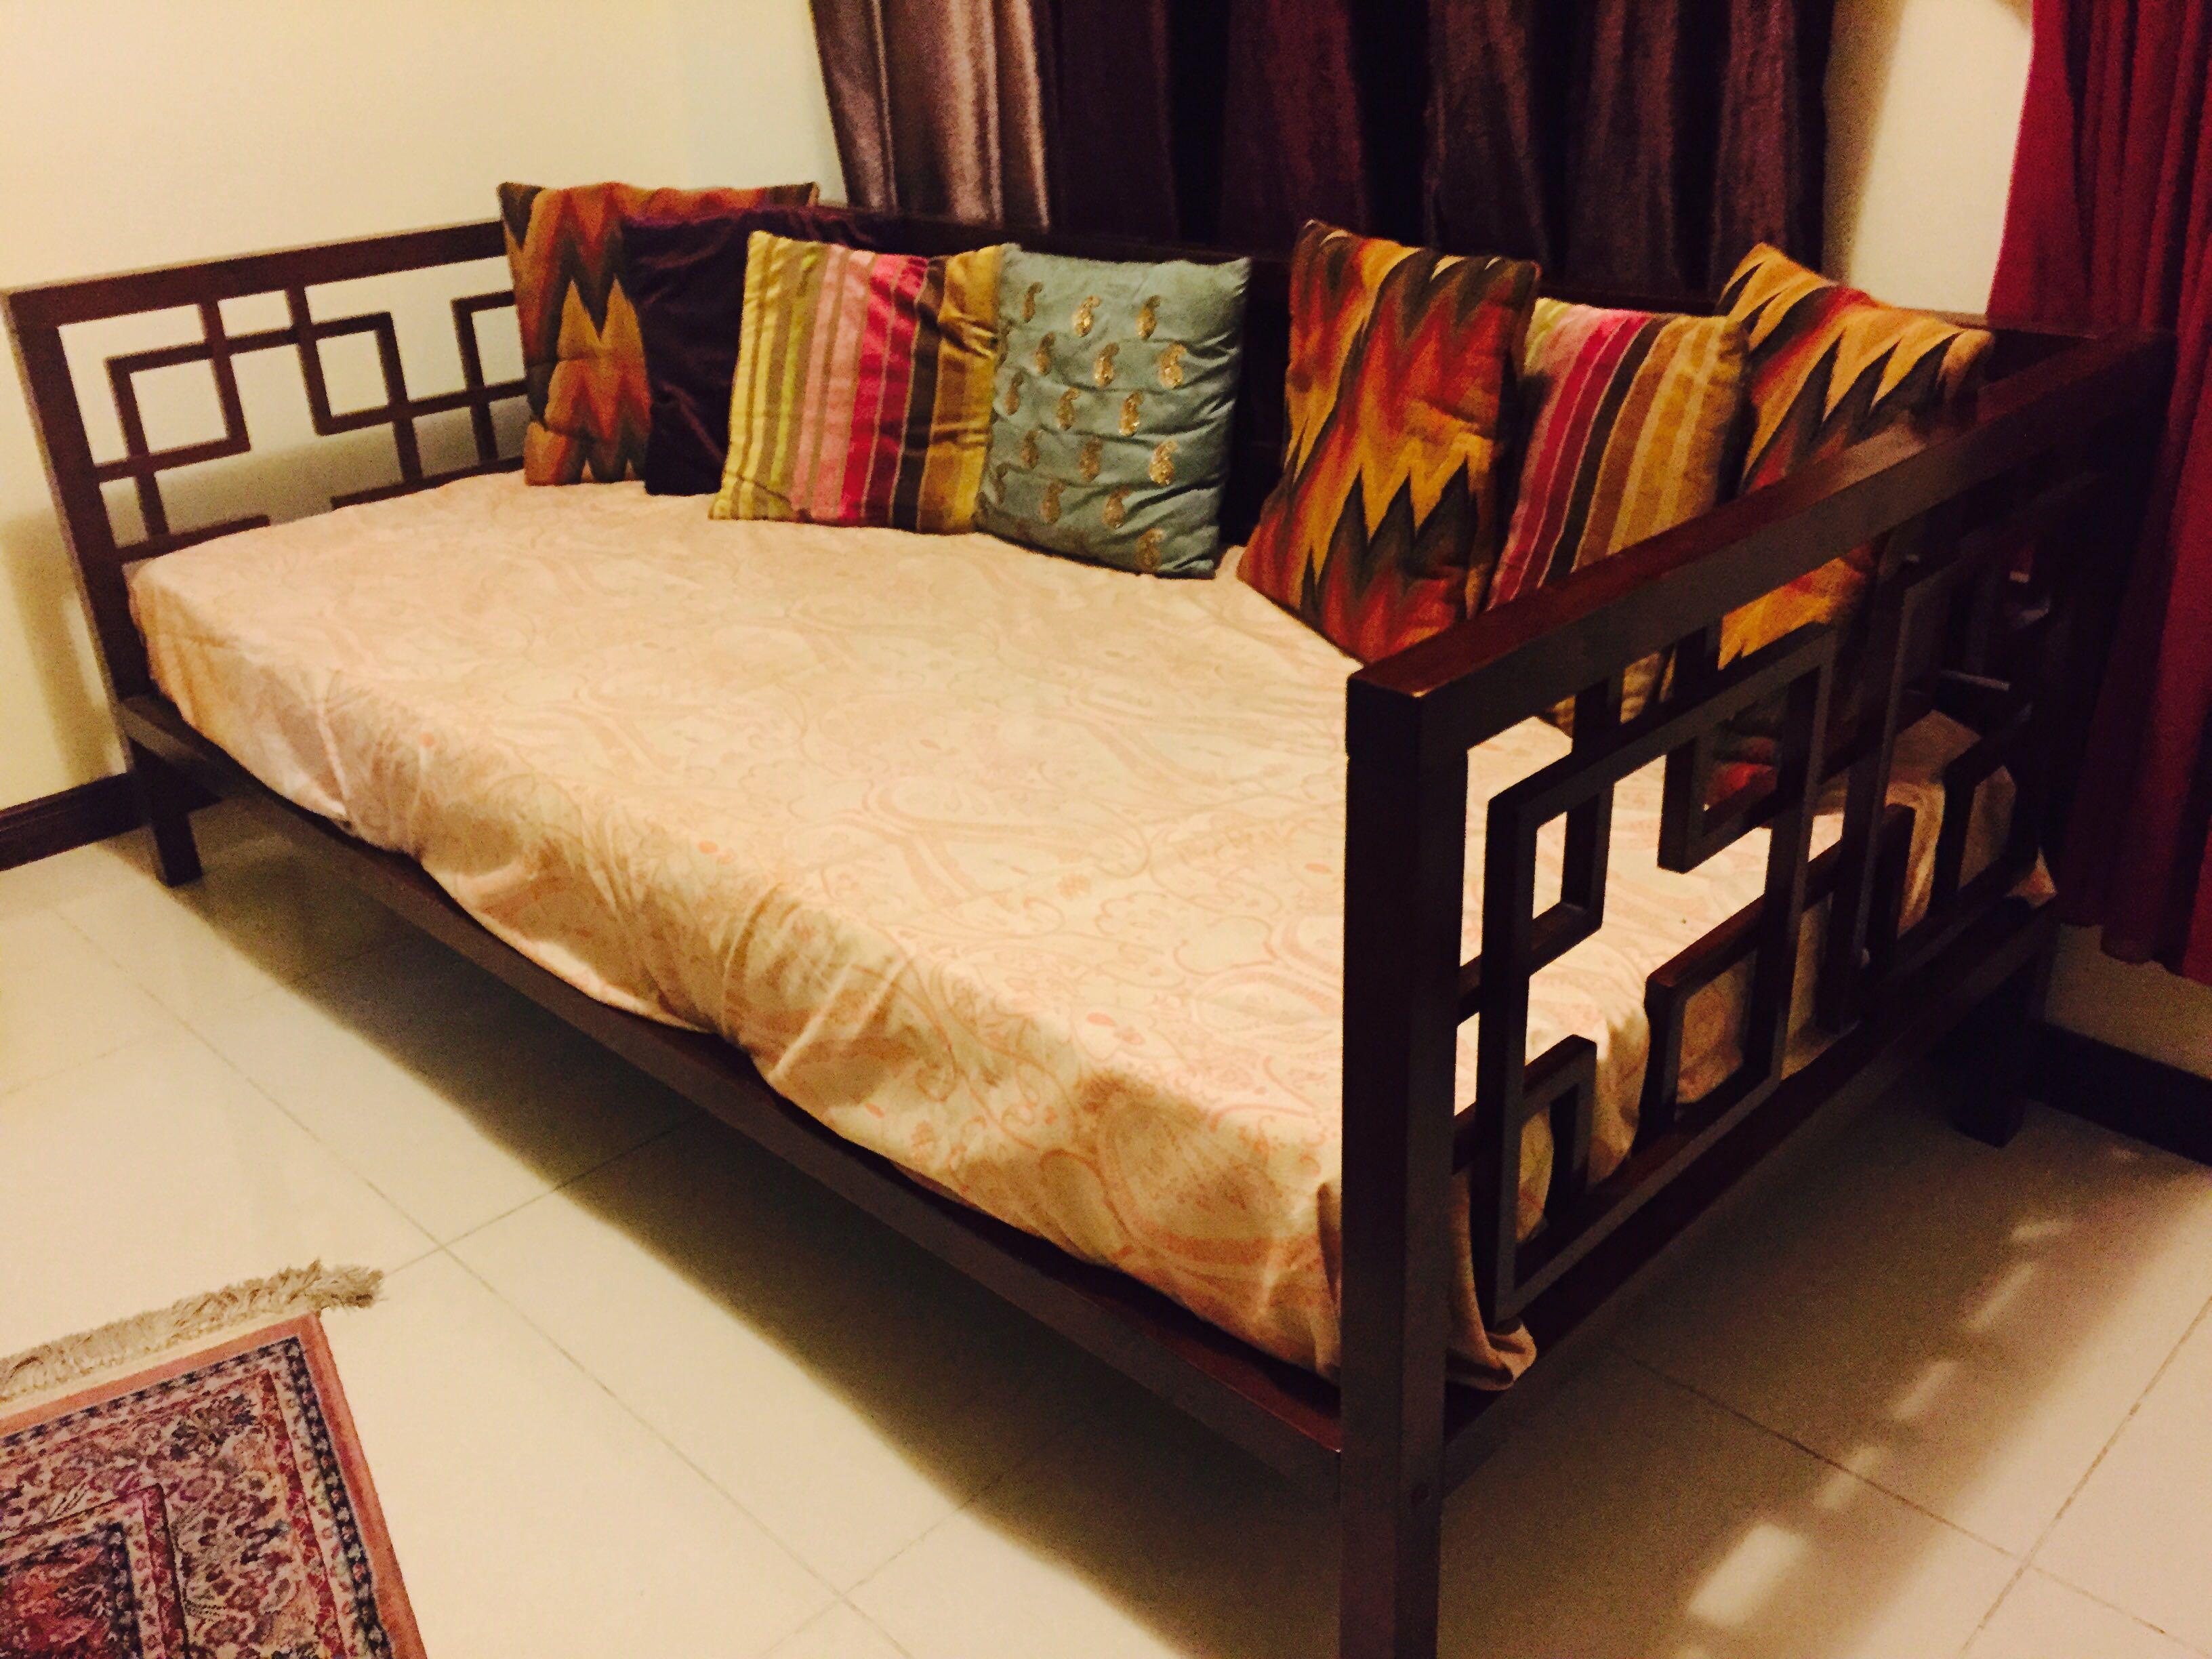 Bed Like Sofa Qatar Living